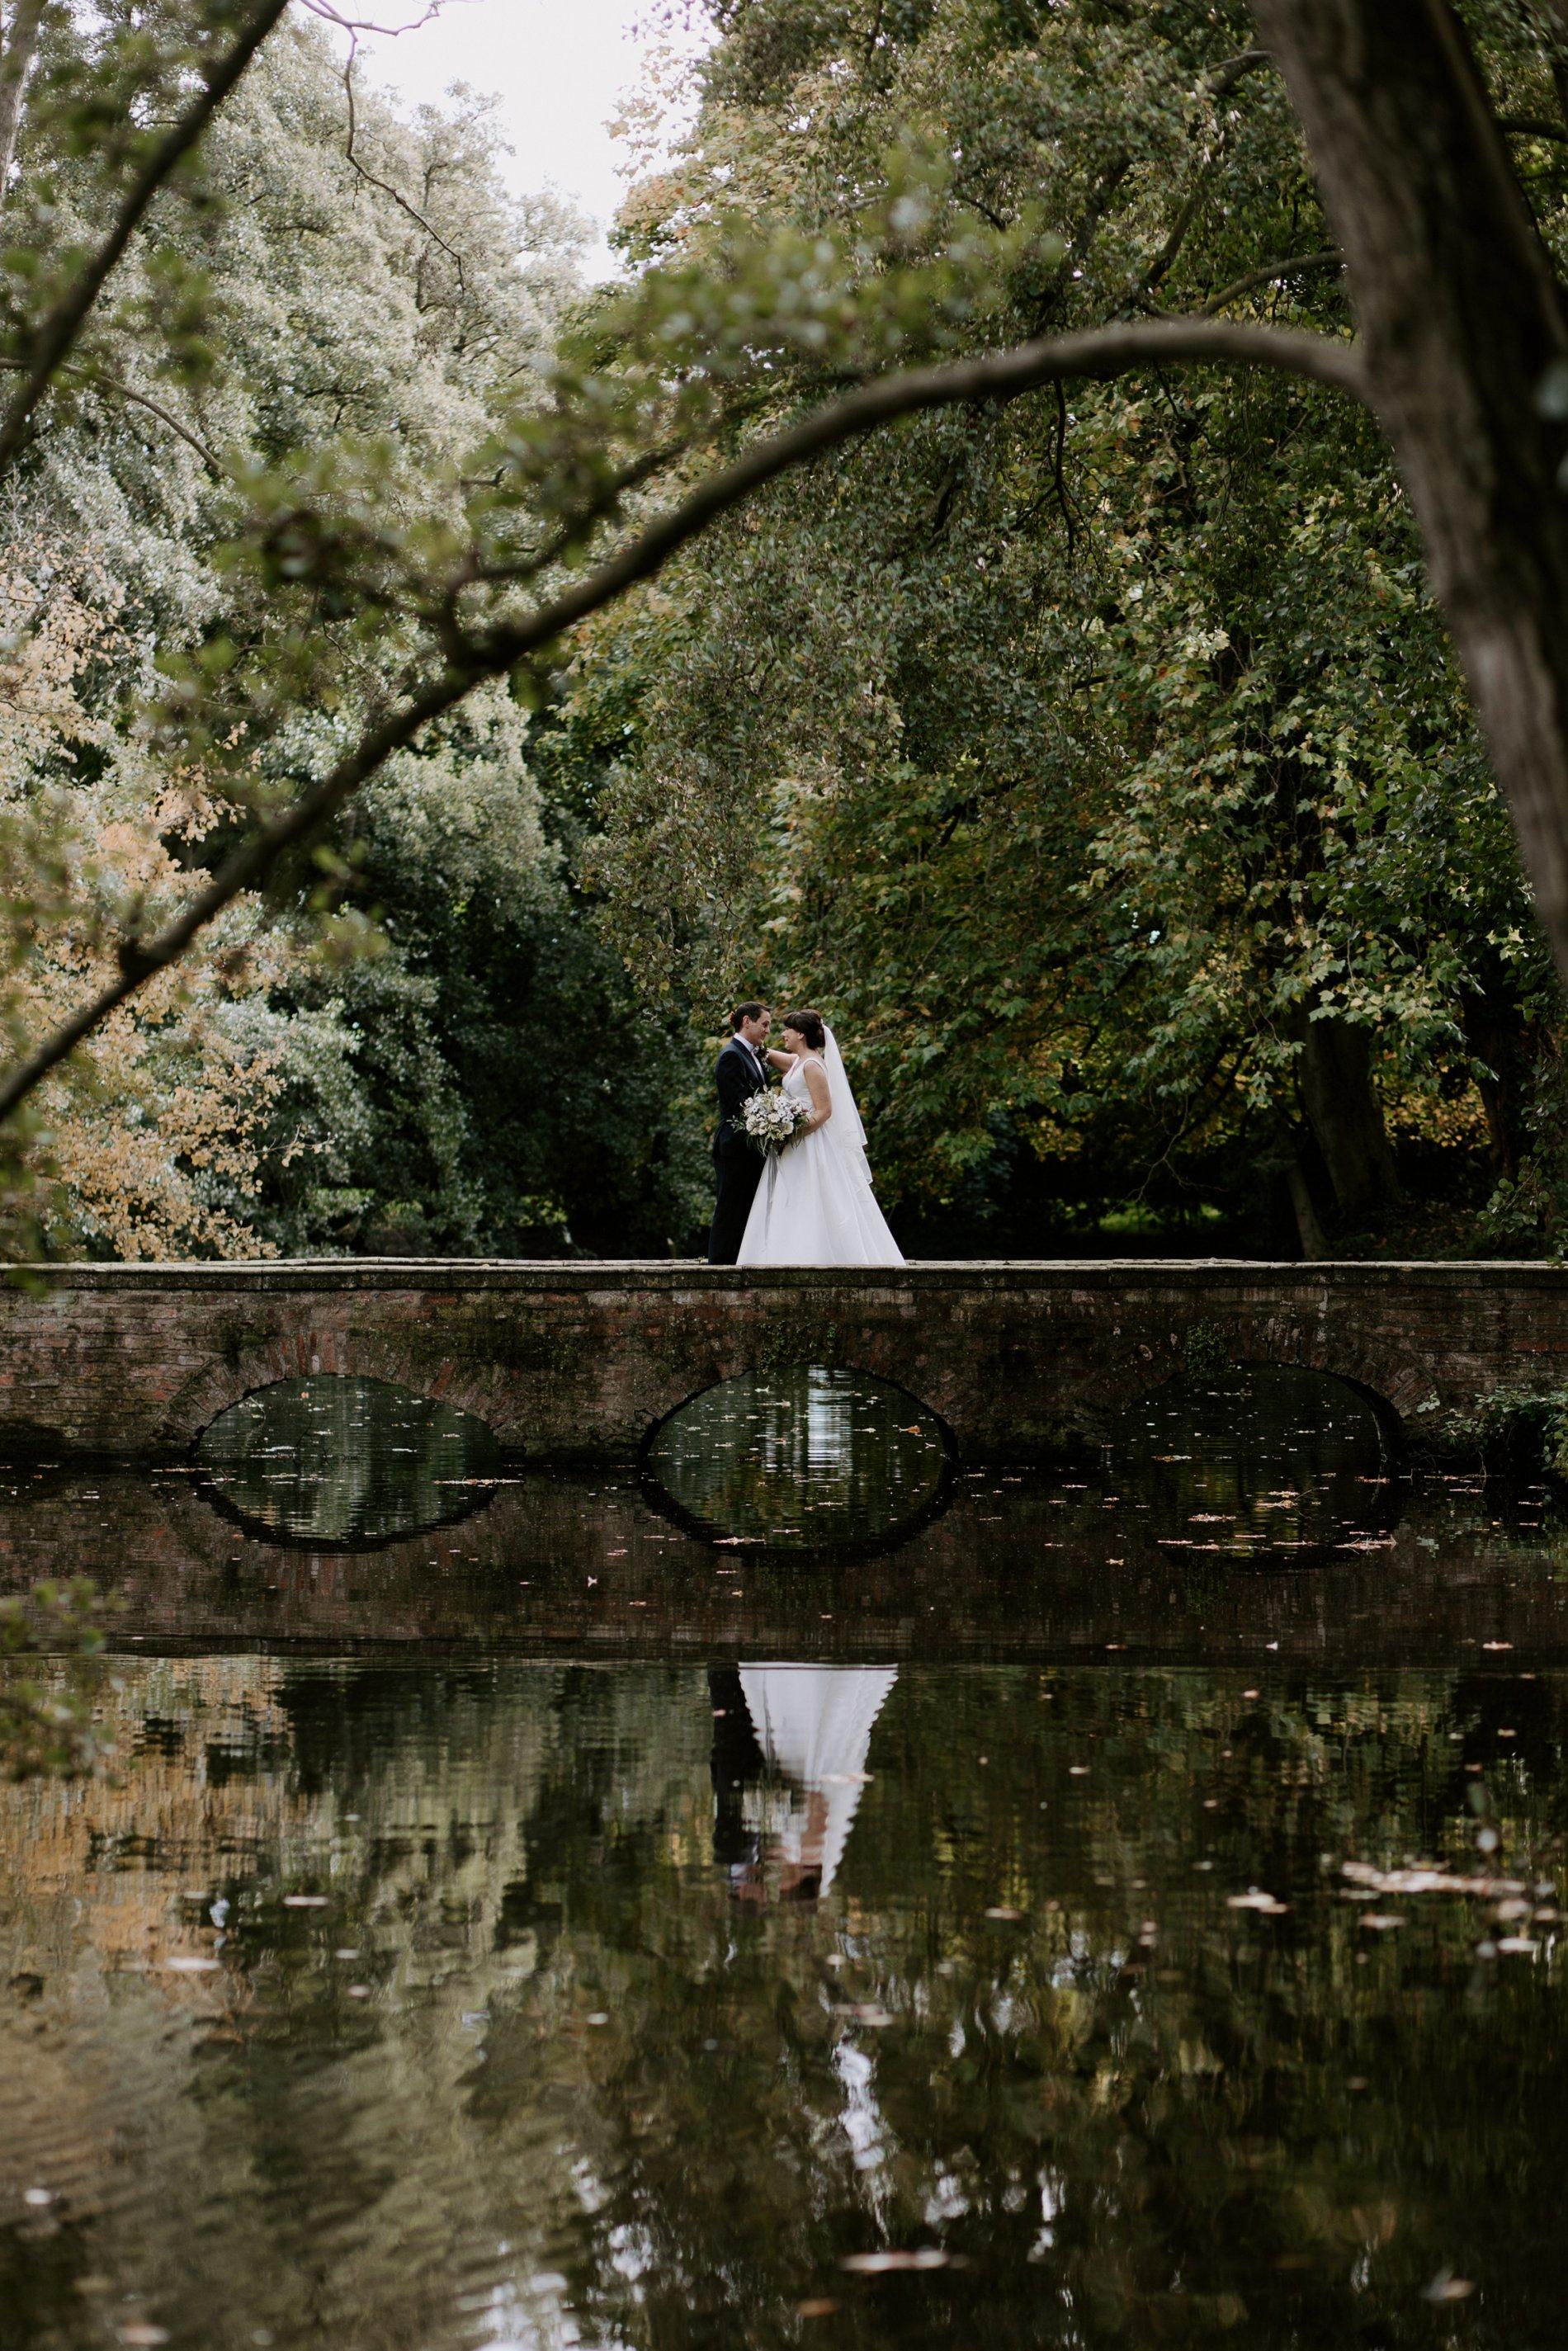 An Elegant White Wedding at Thicket Priory (c) Carla Whittingham Photography (60)